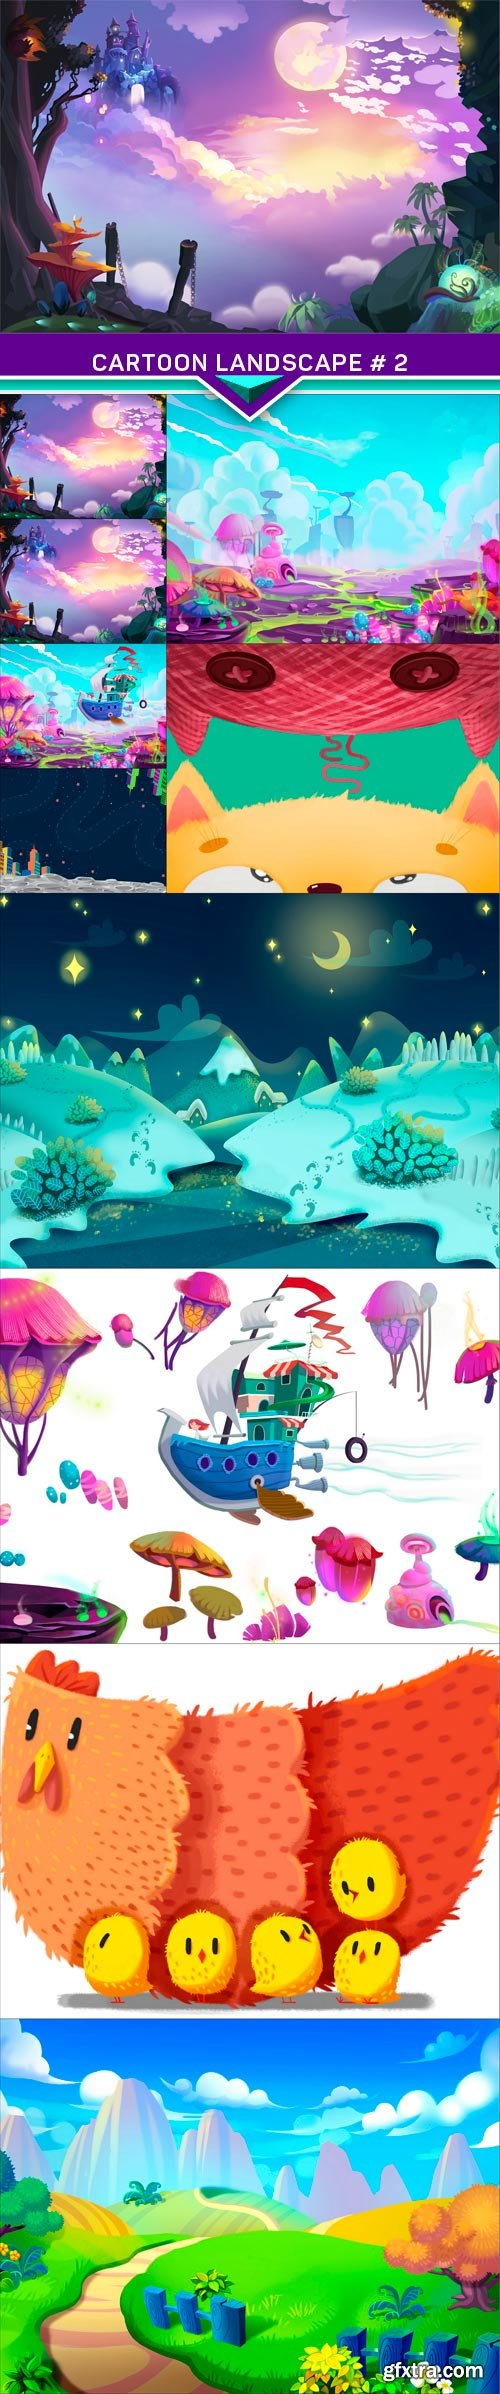 Cartoon landscape # 2 10x JPEG